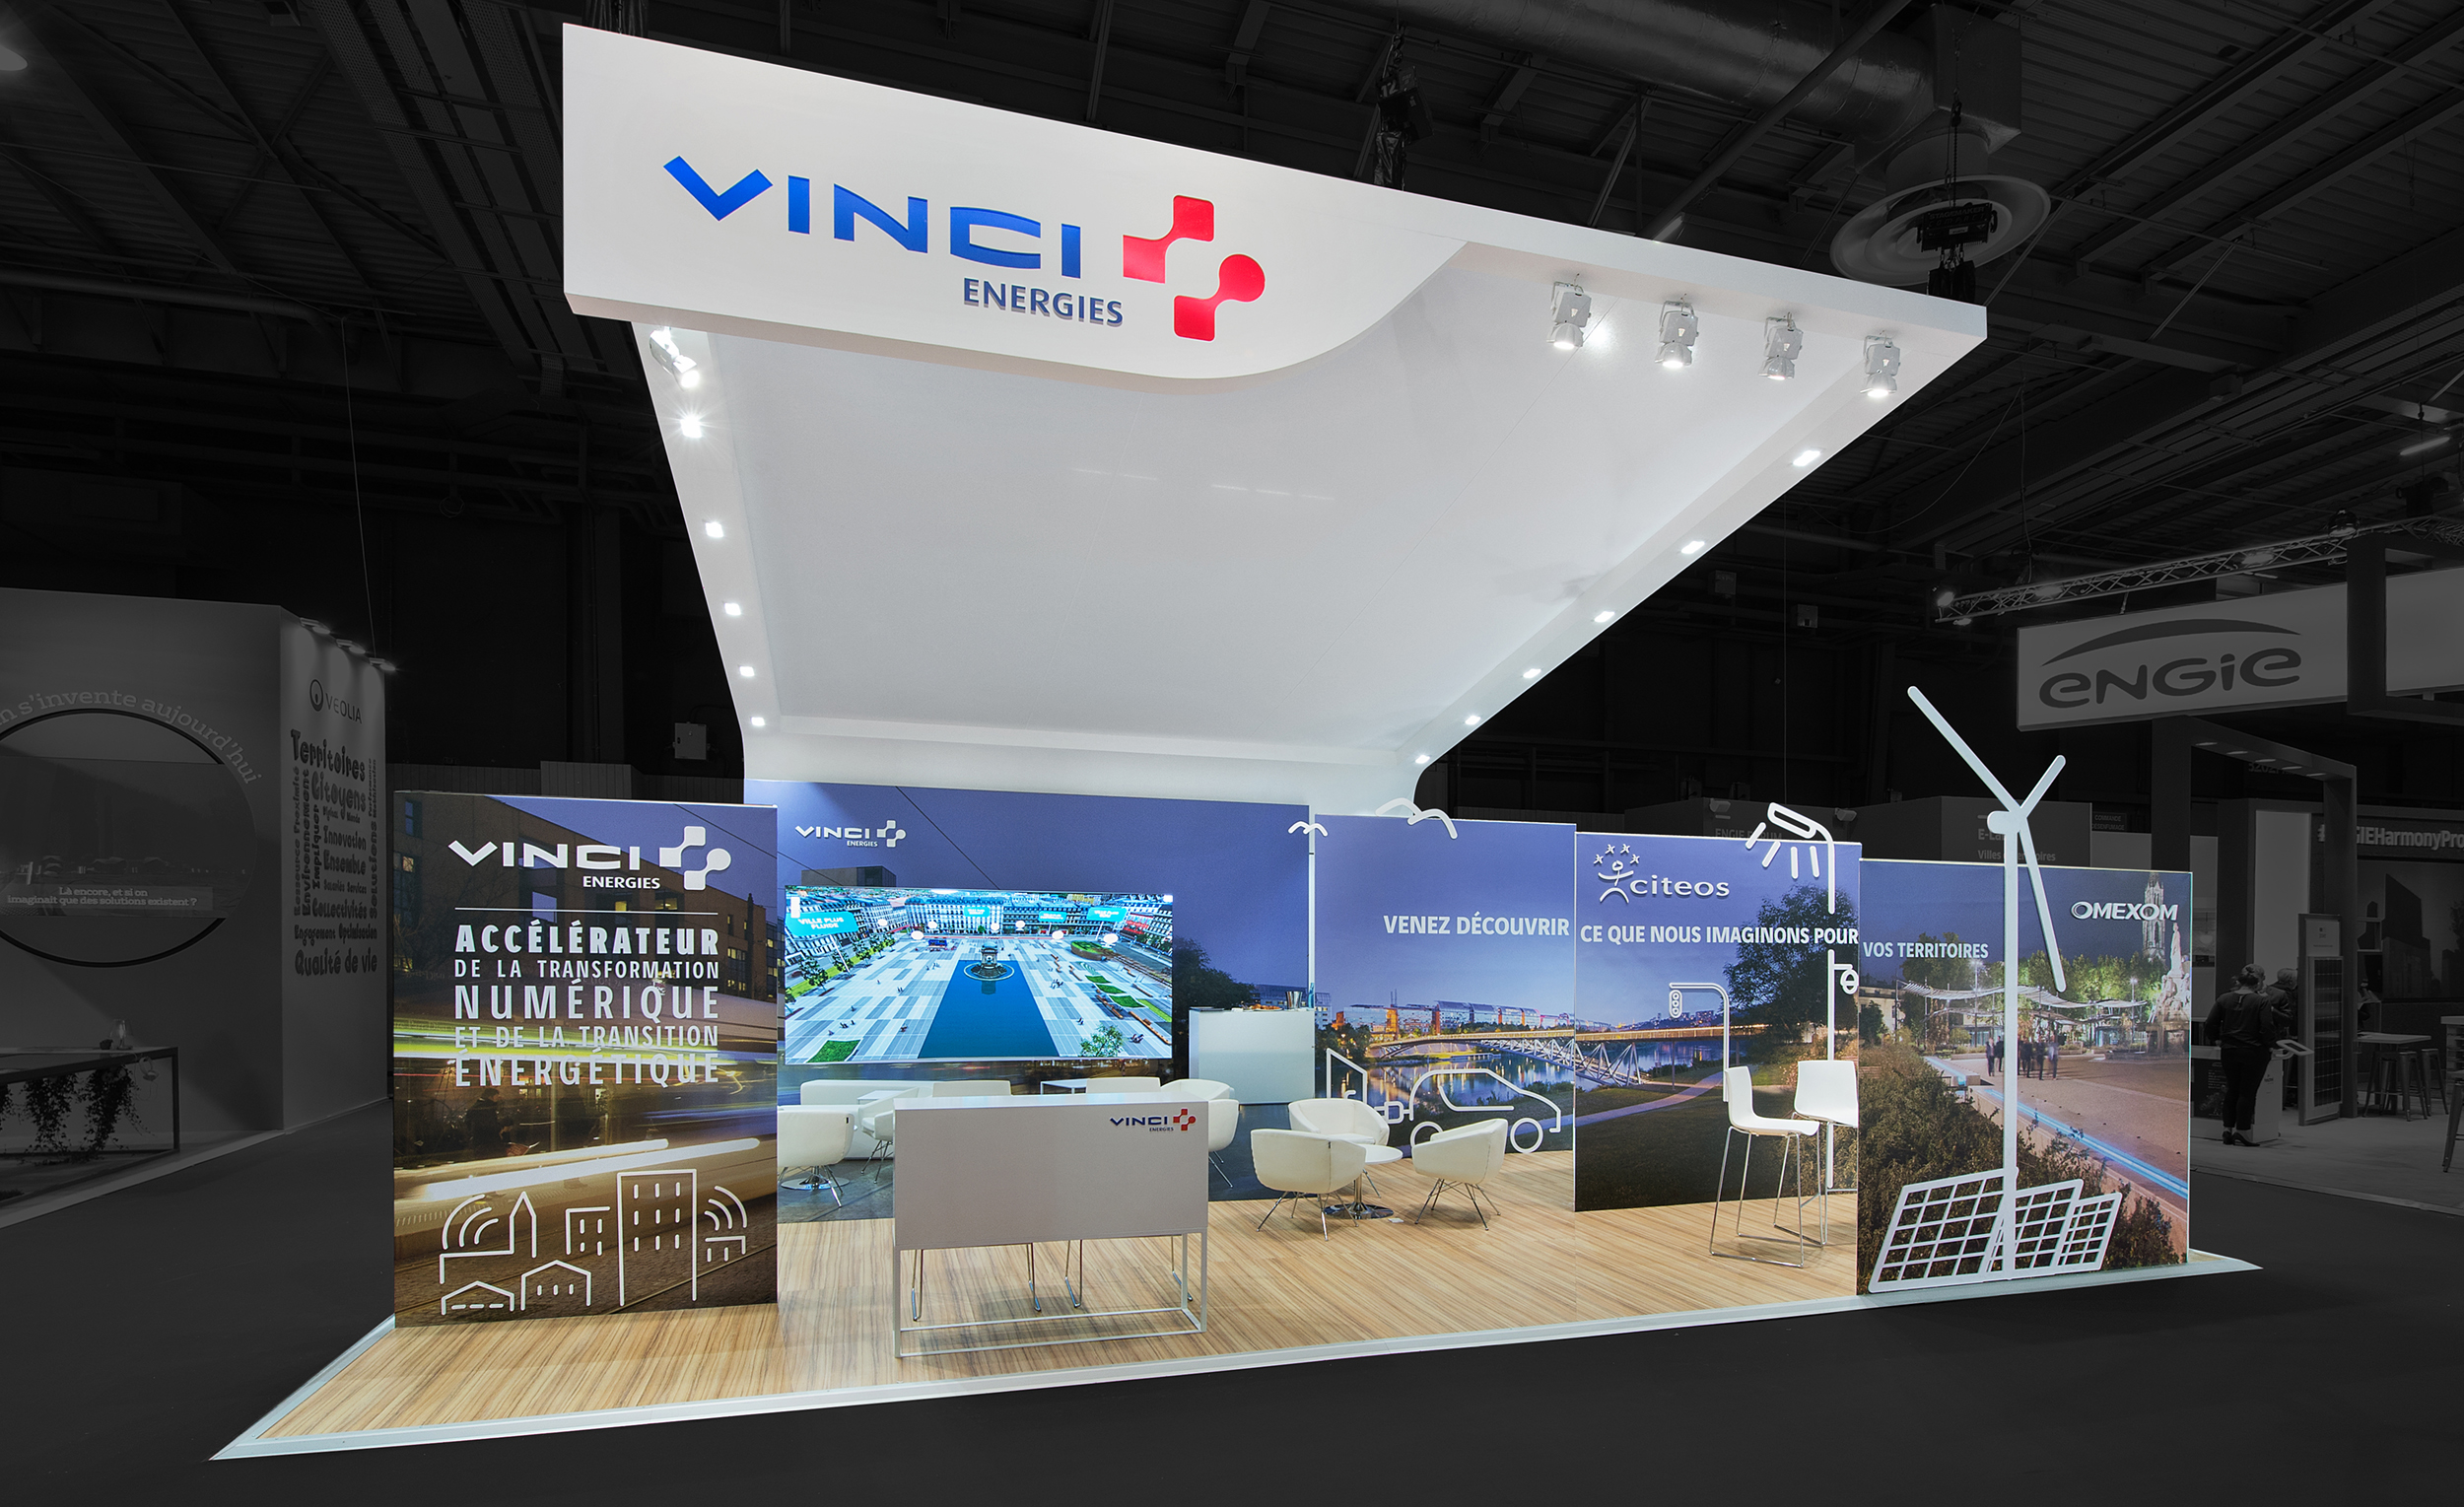 VINCI SMCL 3 2018 V501296 2500.jpg